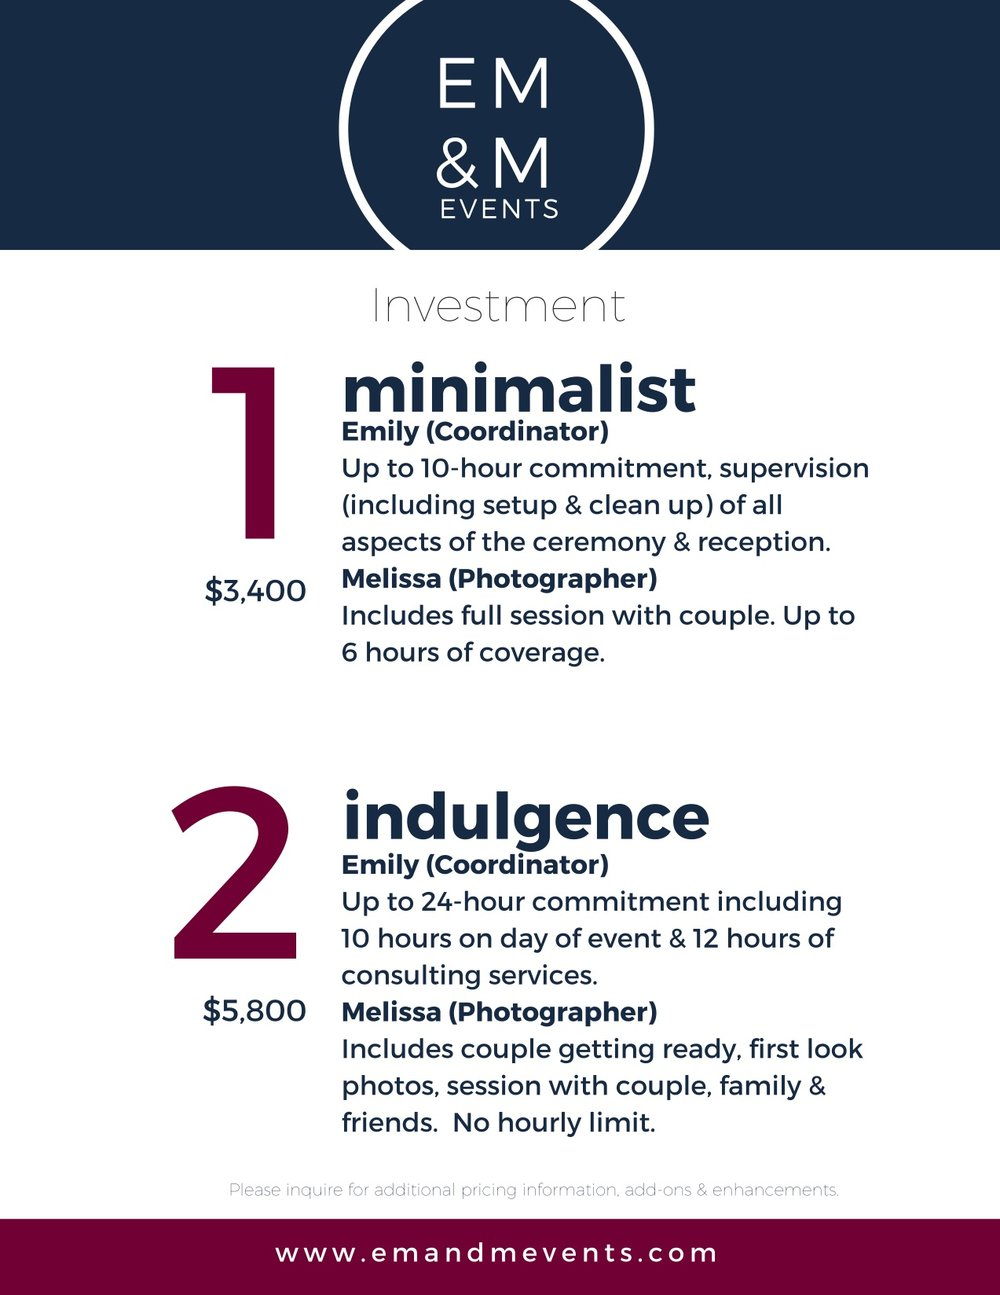 em&m price list-QE.jpg